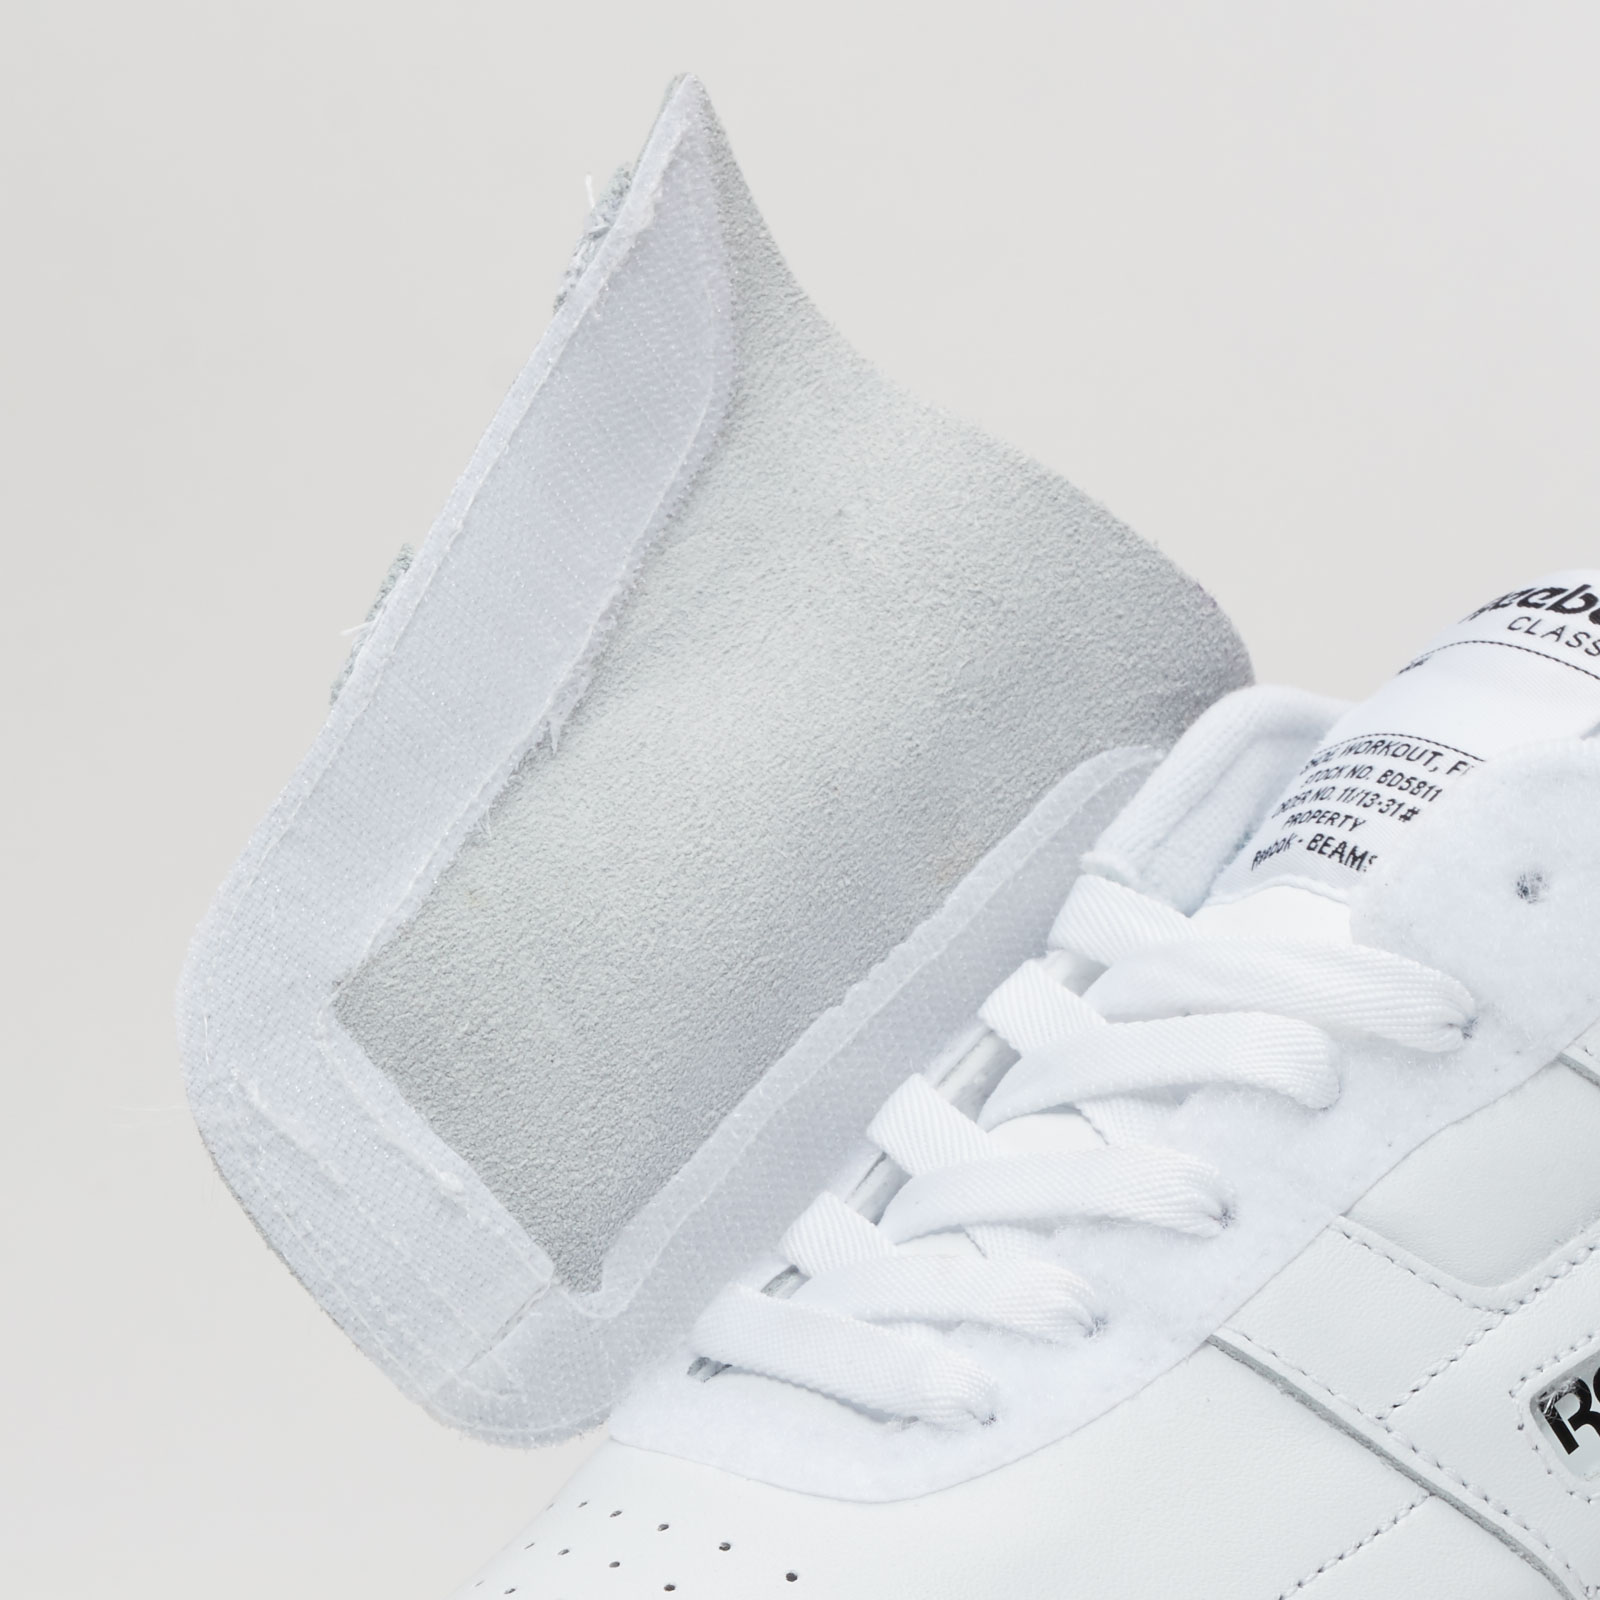 11561f35c8f46 Reebok Beams X Workout Lo Clean - Bd5811 - Sneakersnstuff